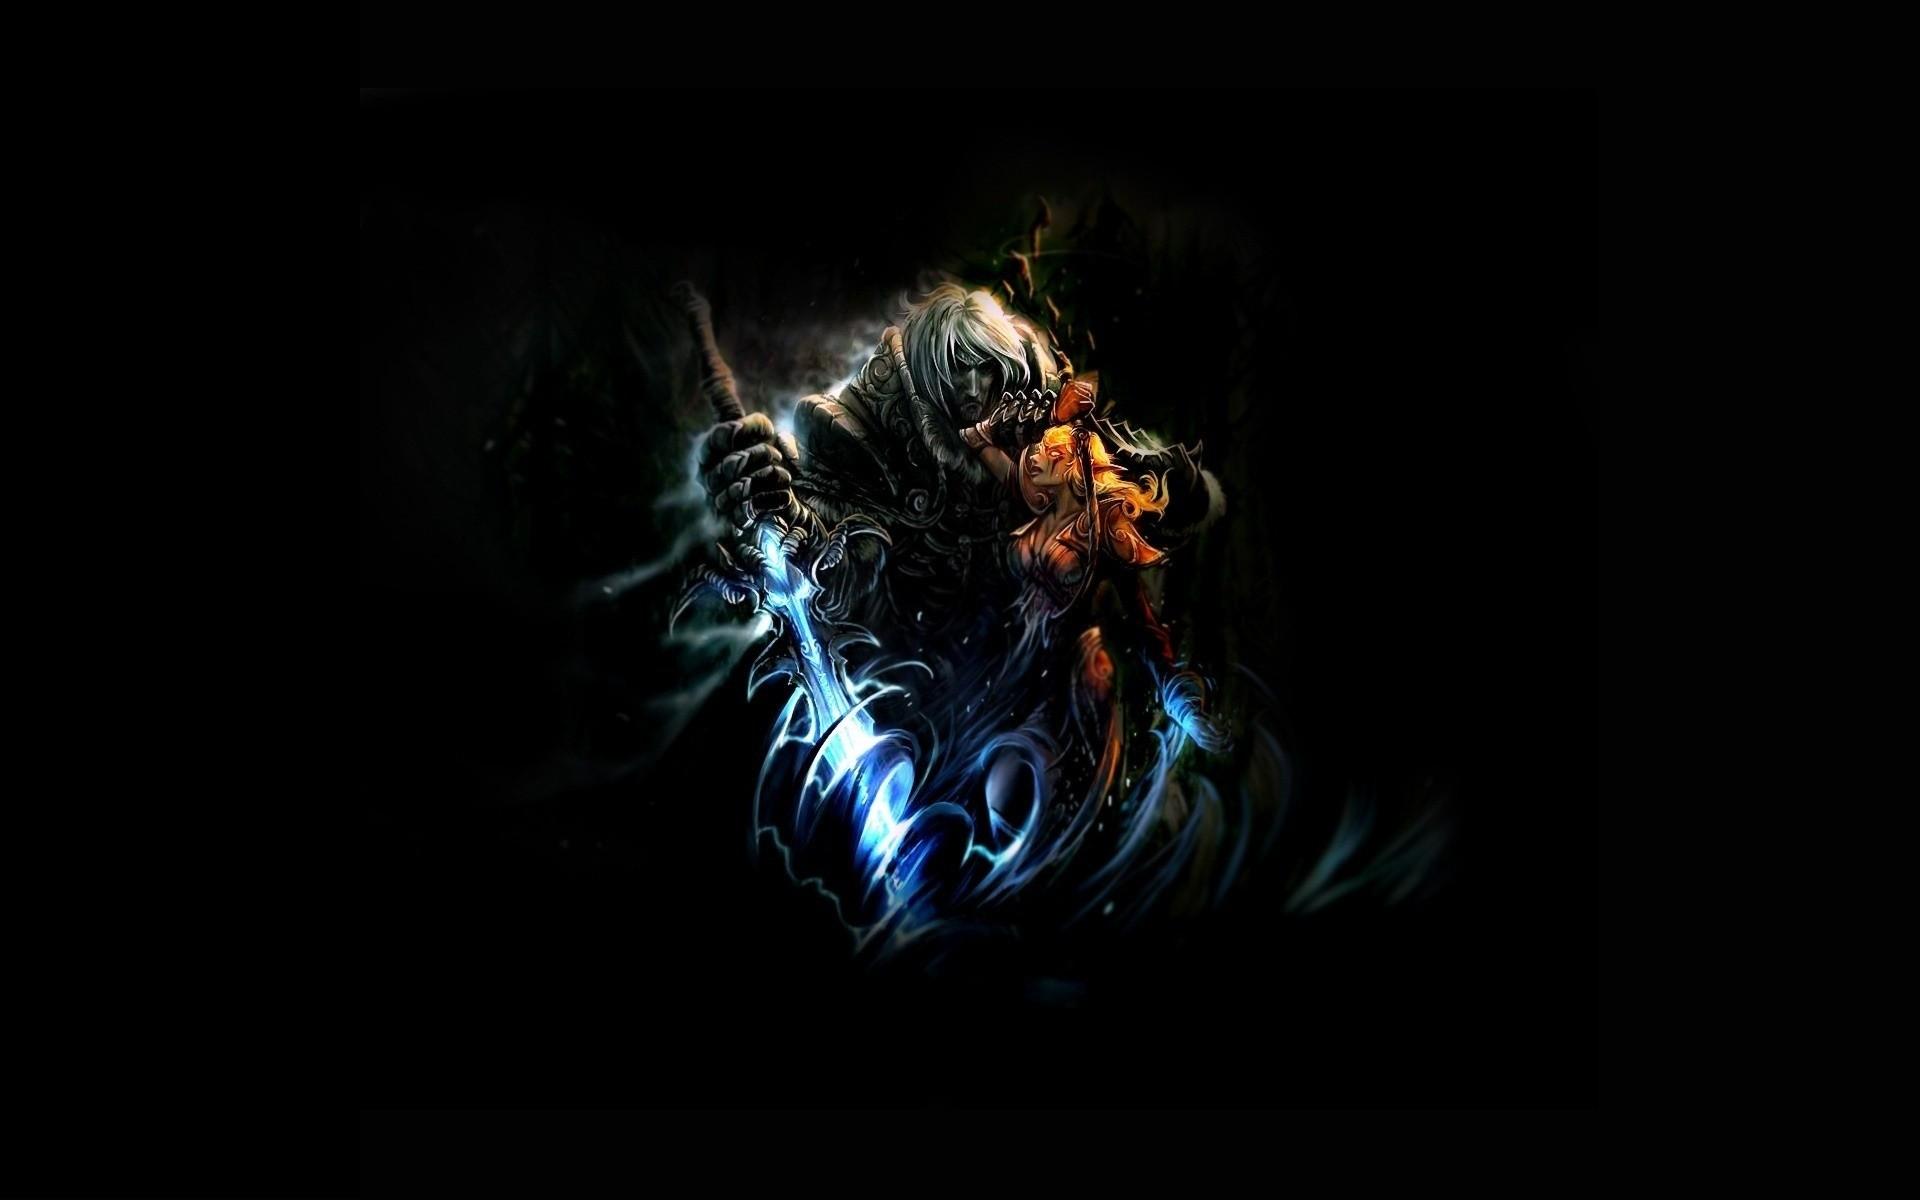 … World of Warcraft Wallpapers | Album on Imgur